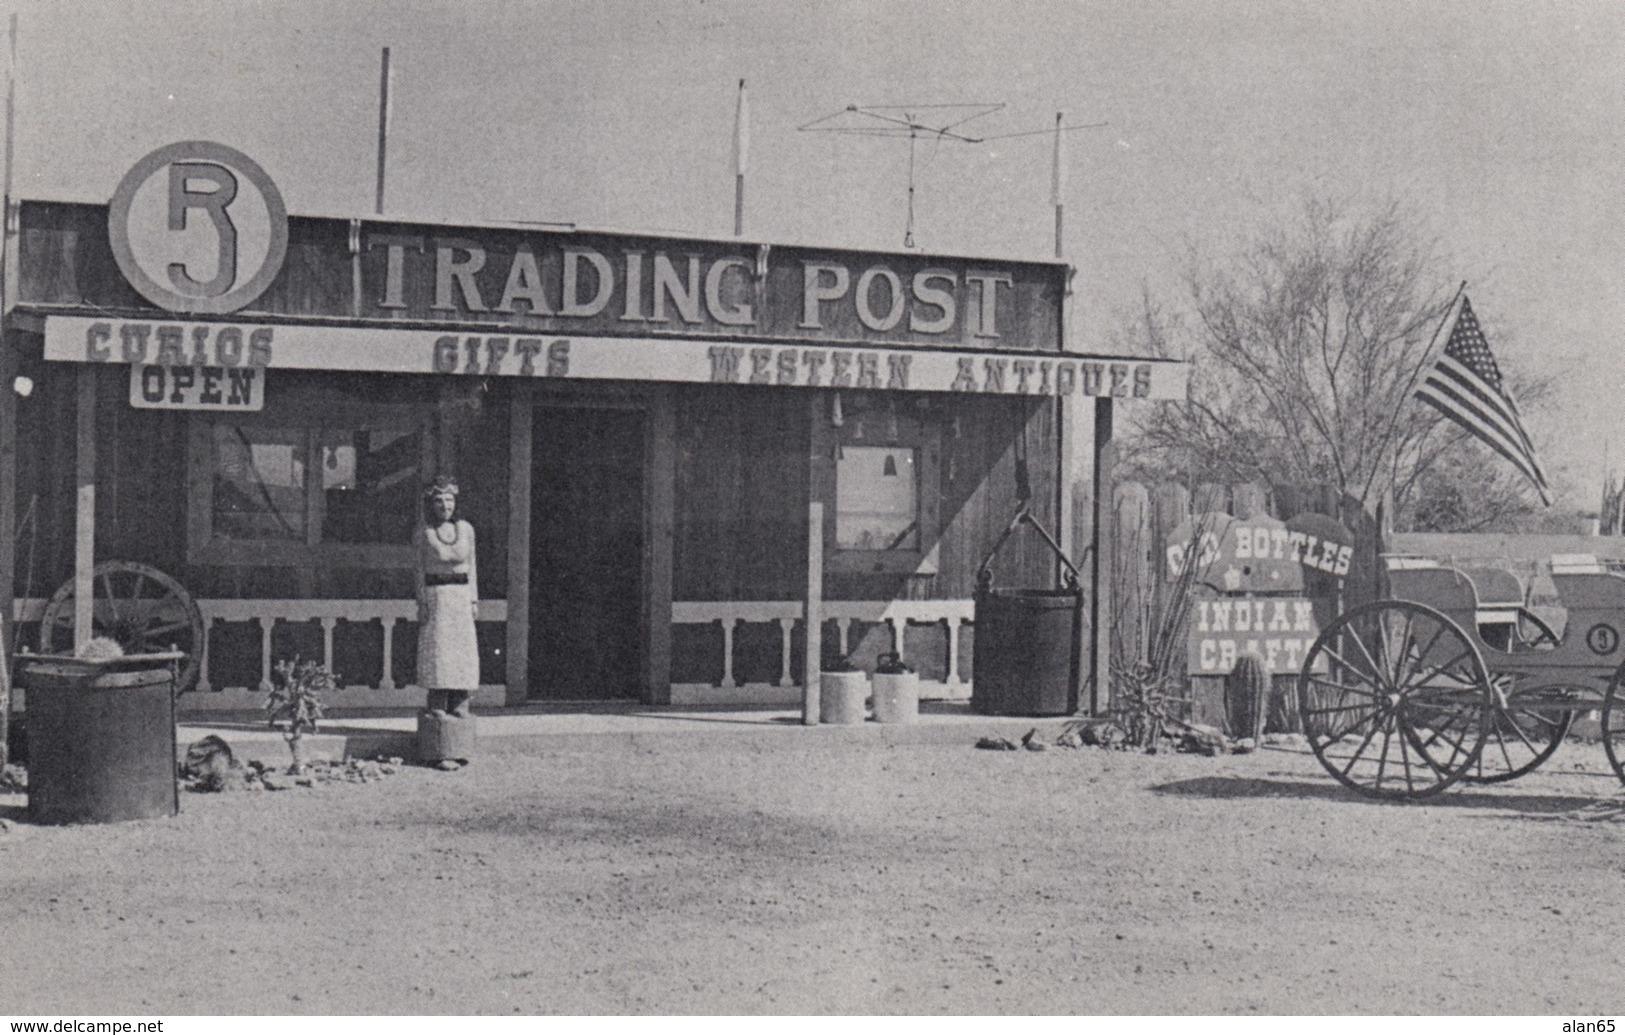 Martizez Lake Arizona, R Circle J Trading Post, Curio And Gift Store On Colorado River C1960s Vintage Postcard - United States